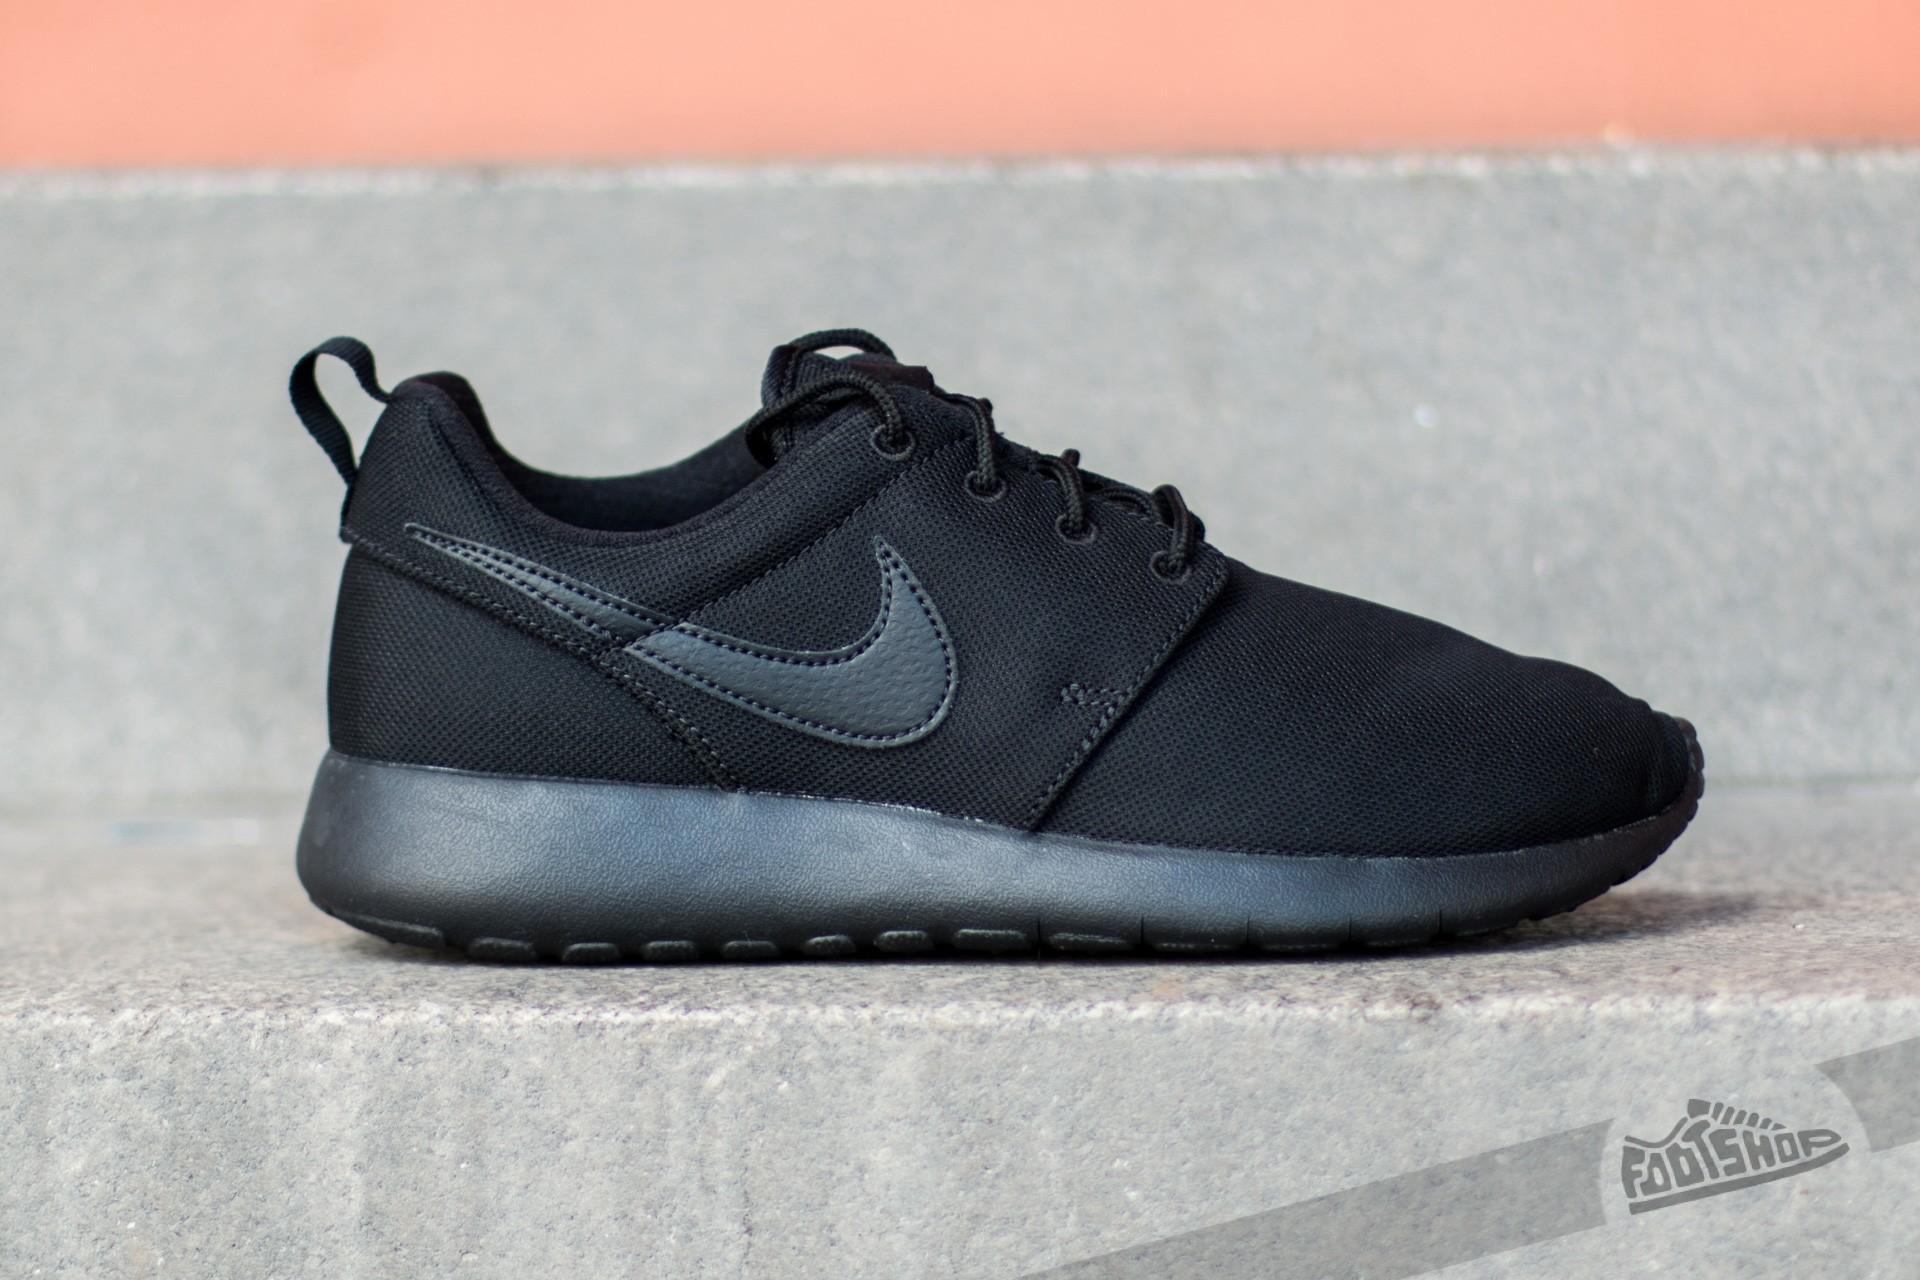 premium selection 8d0c4 795ac Nike Roshe One (GS) Black/ Black-Black | Footshop